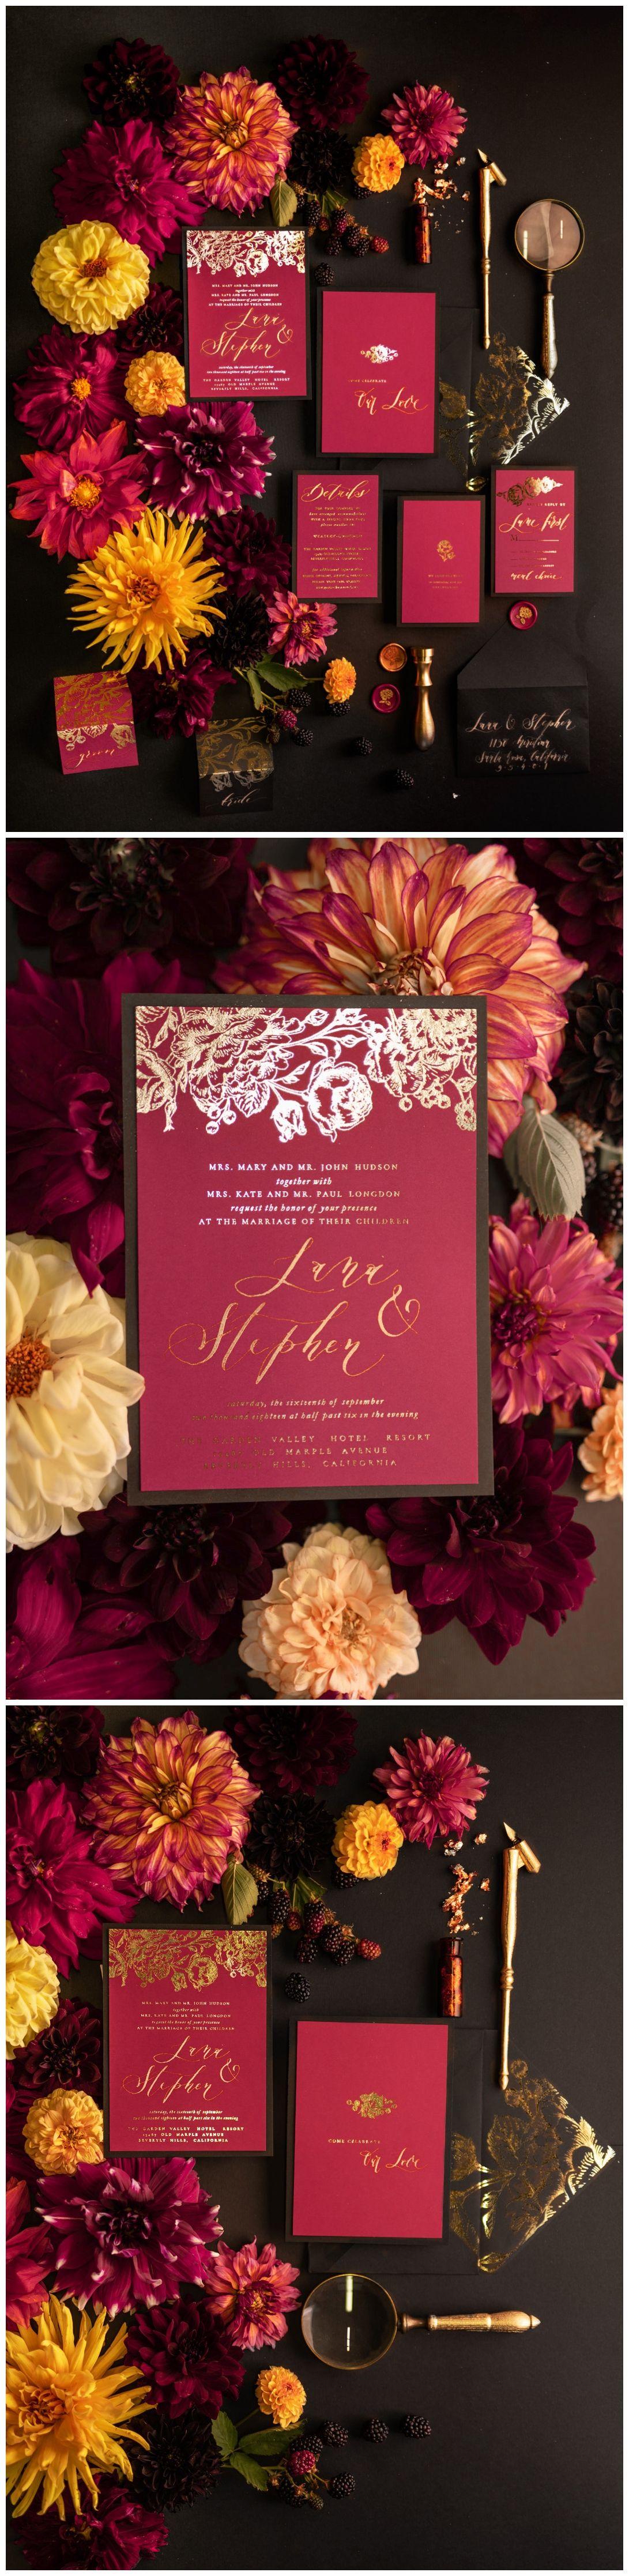 WEDDING INVITATIONS calligraphy | Pinterest | Weddingideas ...